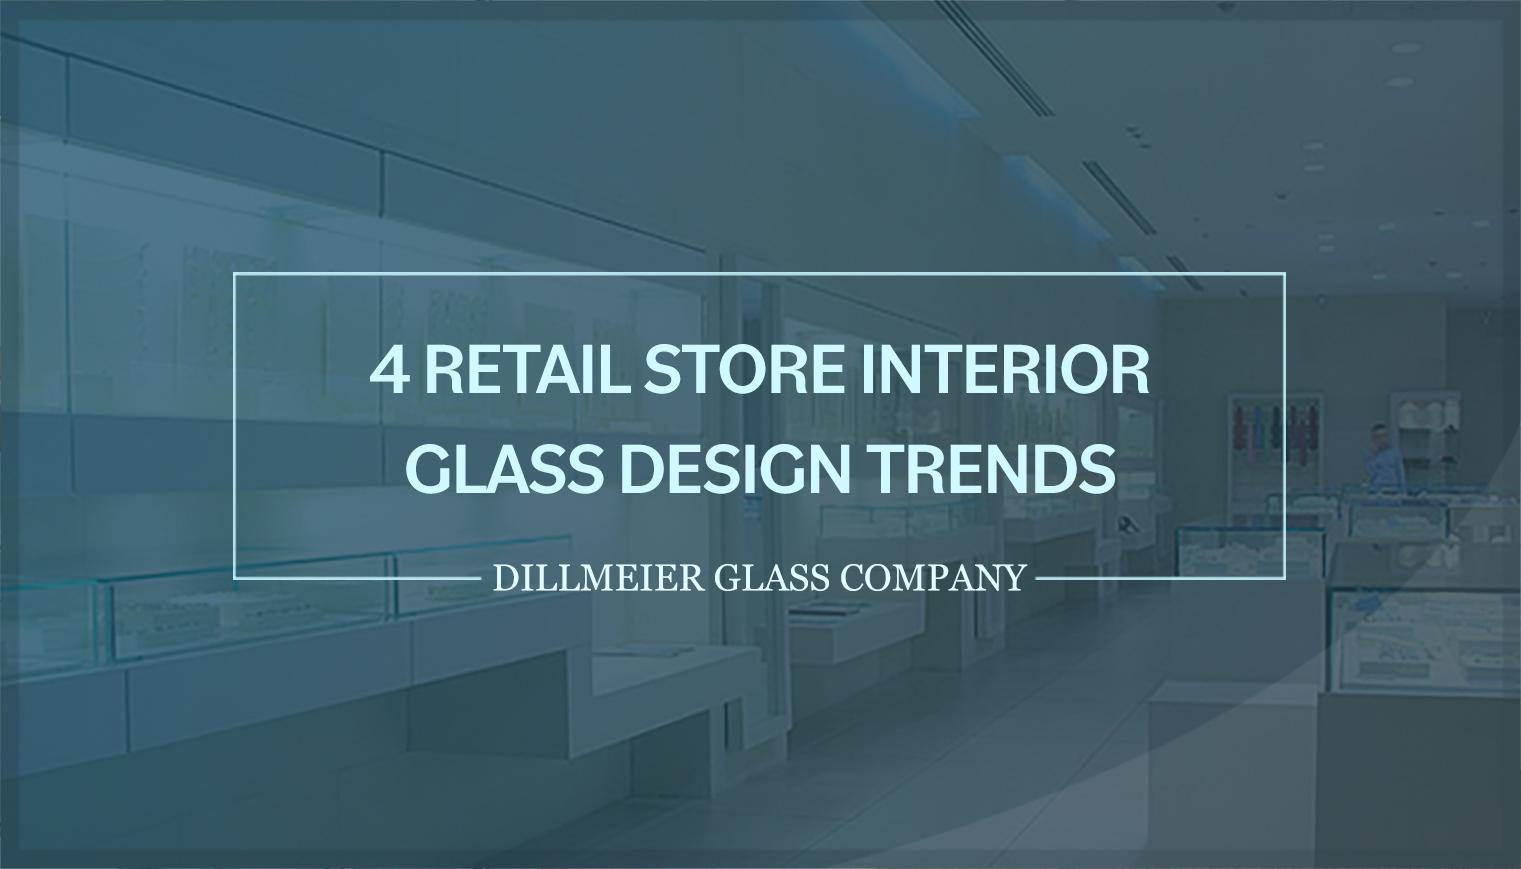 4 Retail Store Interior Glass Design Trends